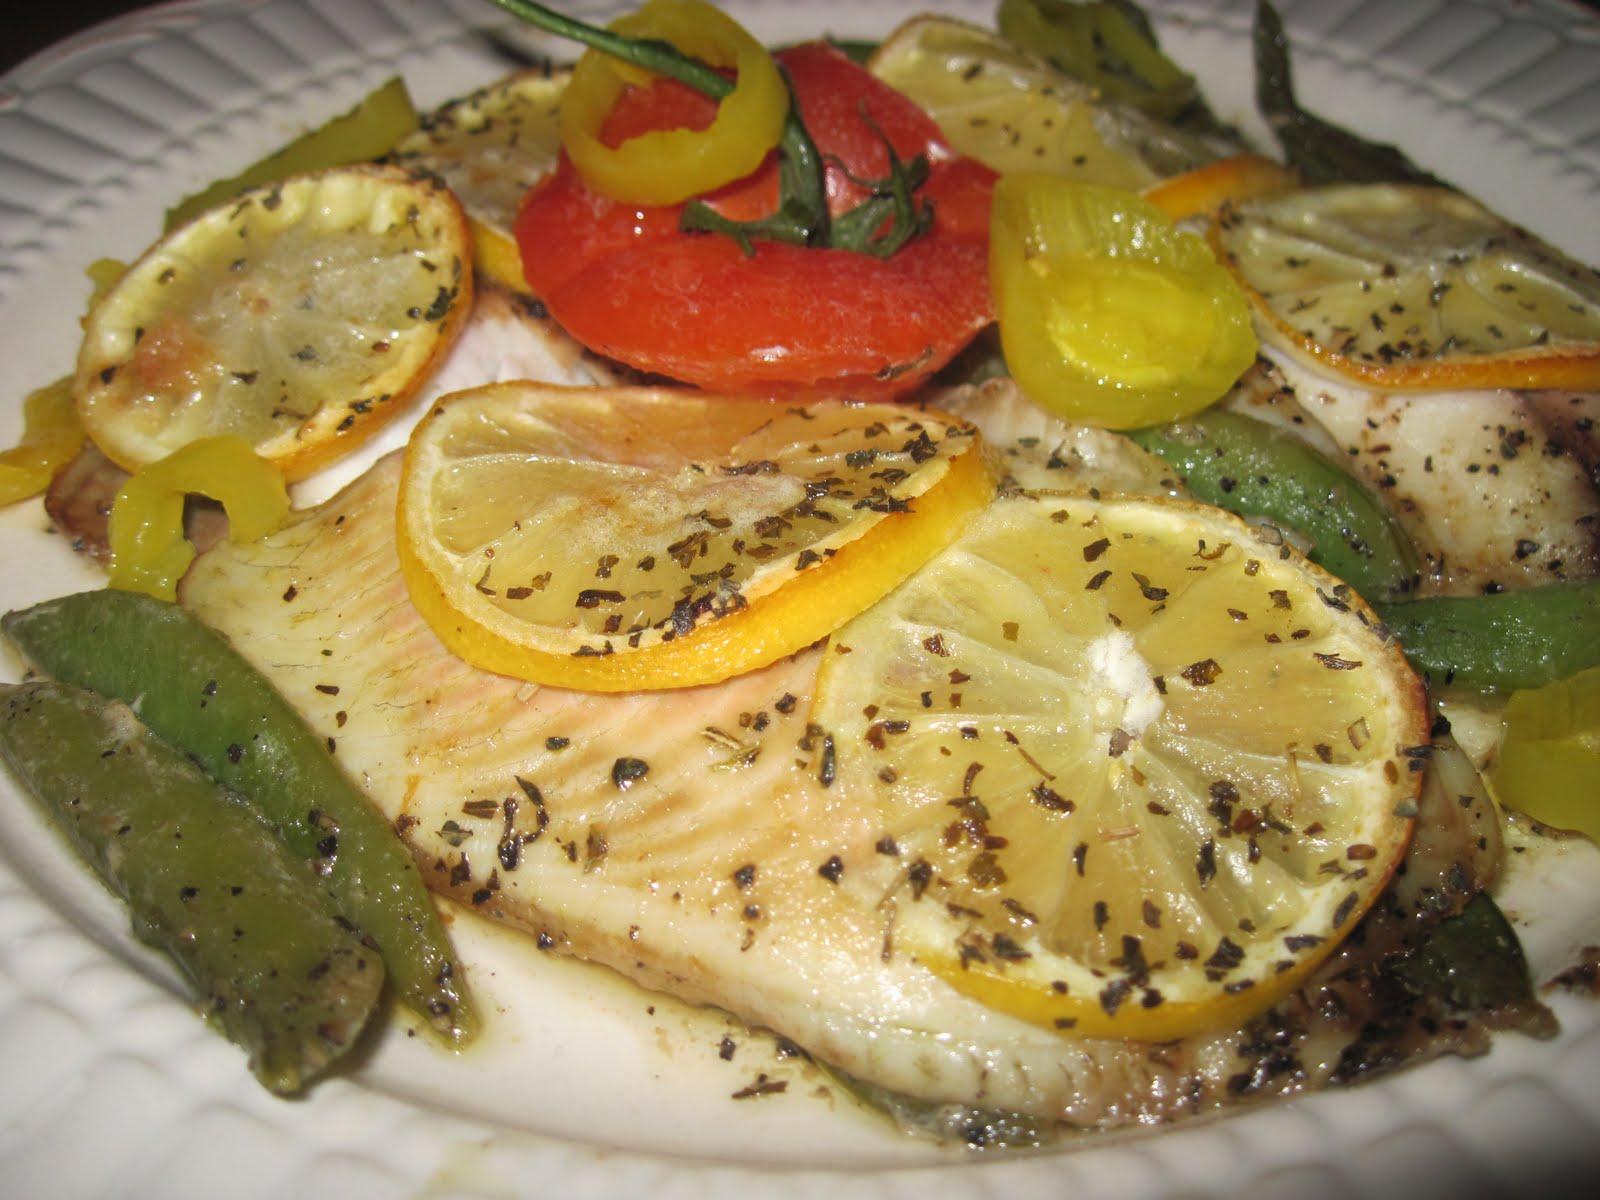 Islandwood recipes baked tilapia de islandwood for How to bake tilapia fish in the oven